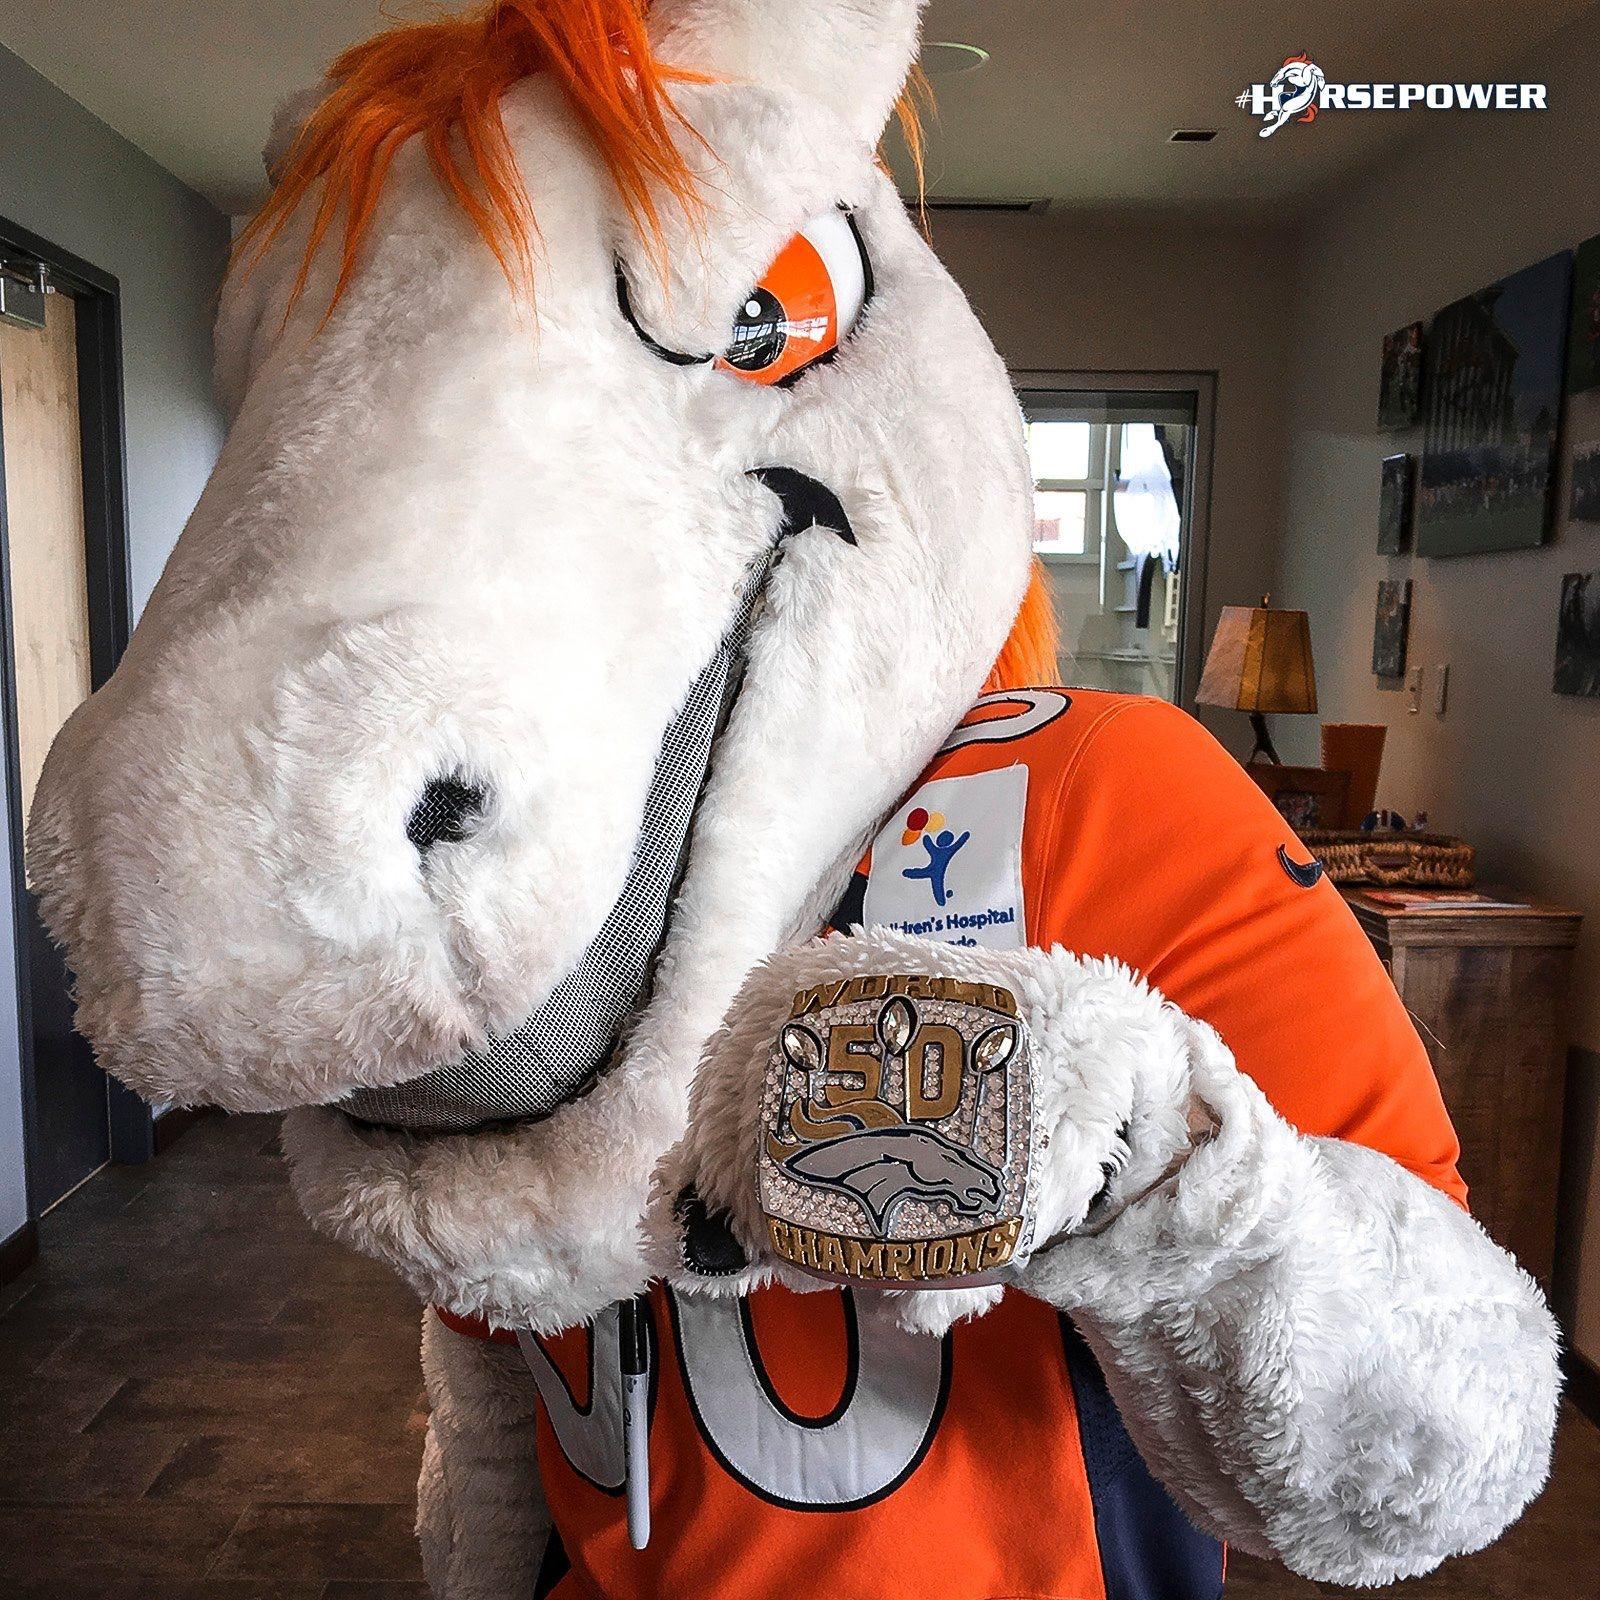 Pin by Stephanie Wood Smith ჱܓ on My Broncos! | Denver ...